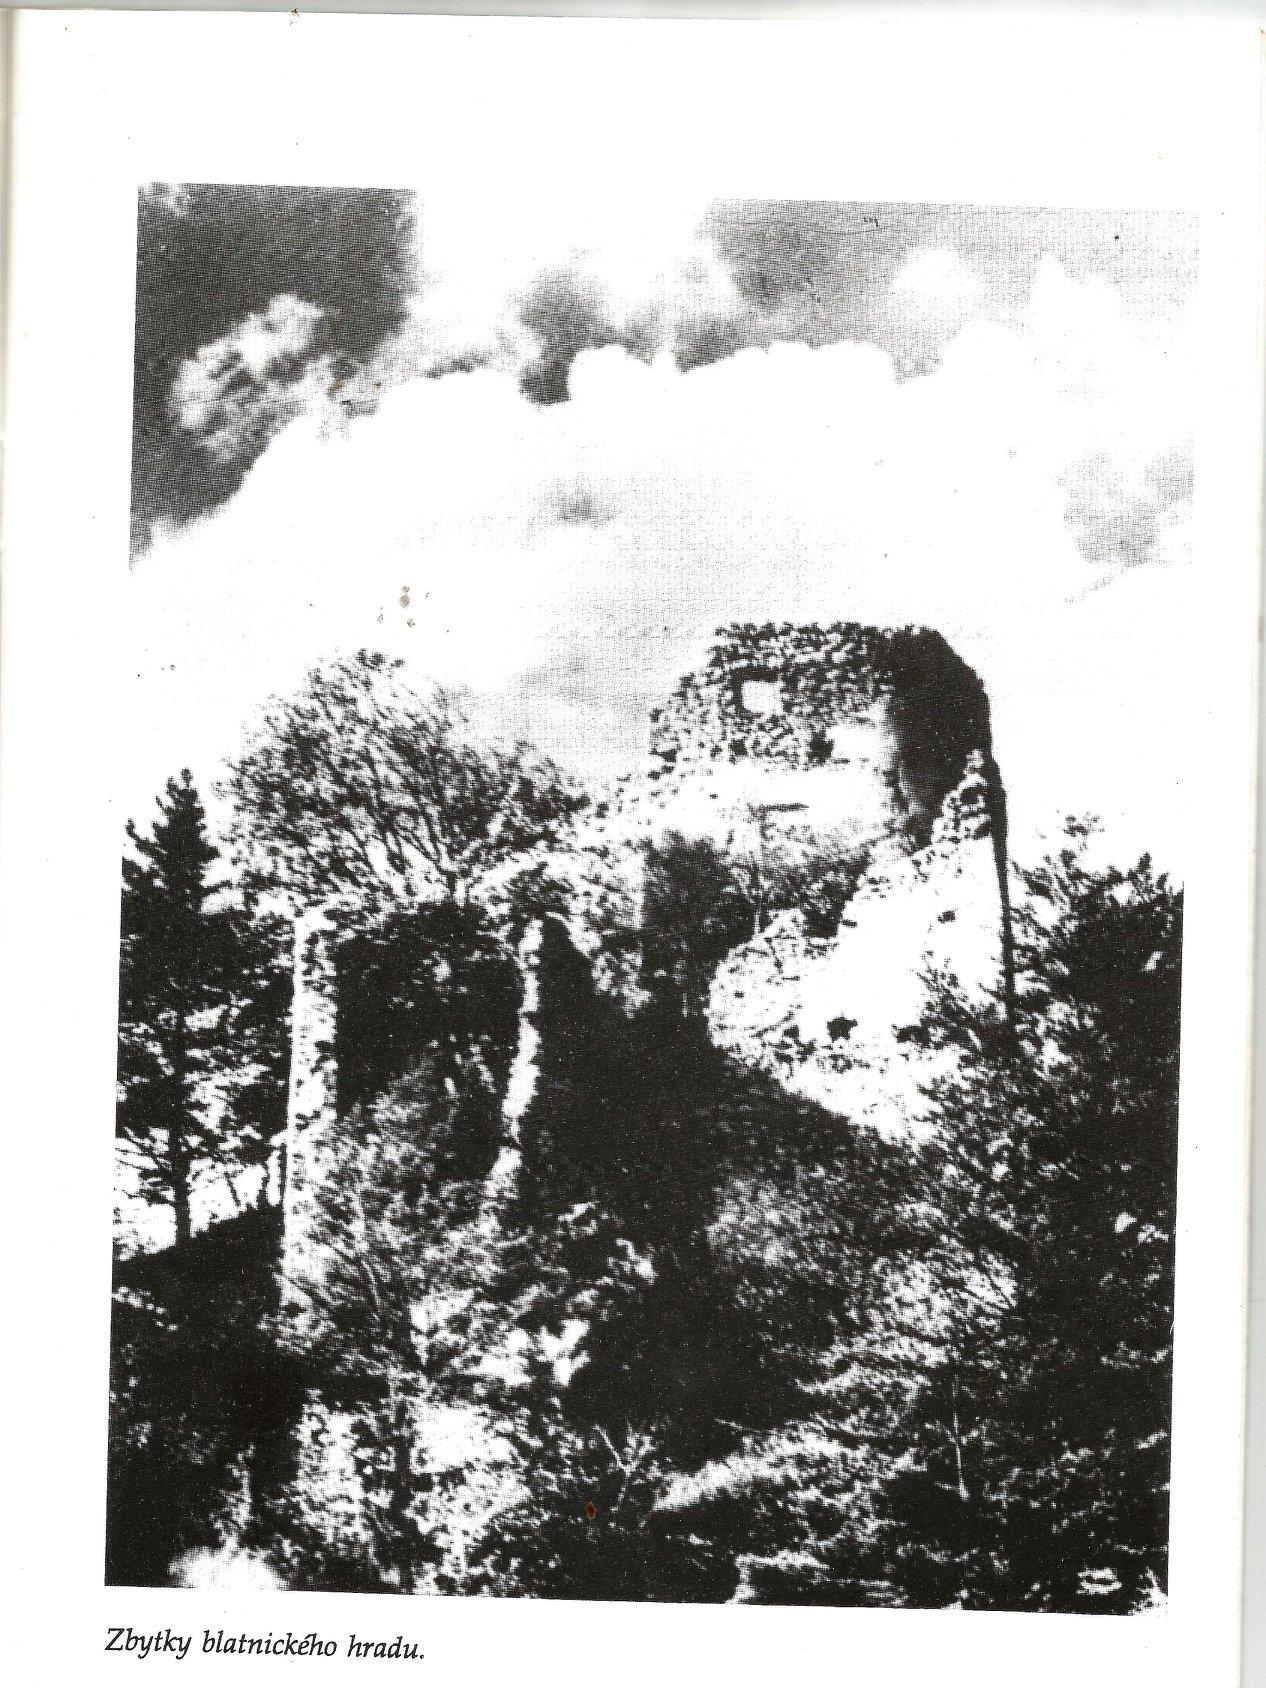 Dobová fotografia hradu Blatnica